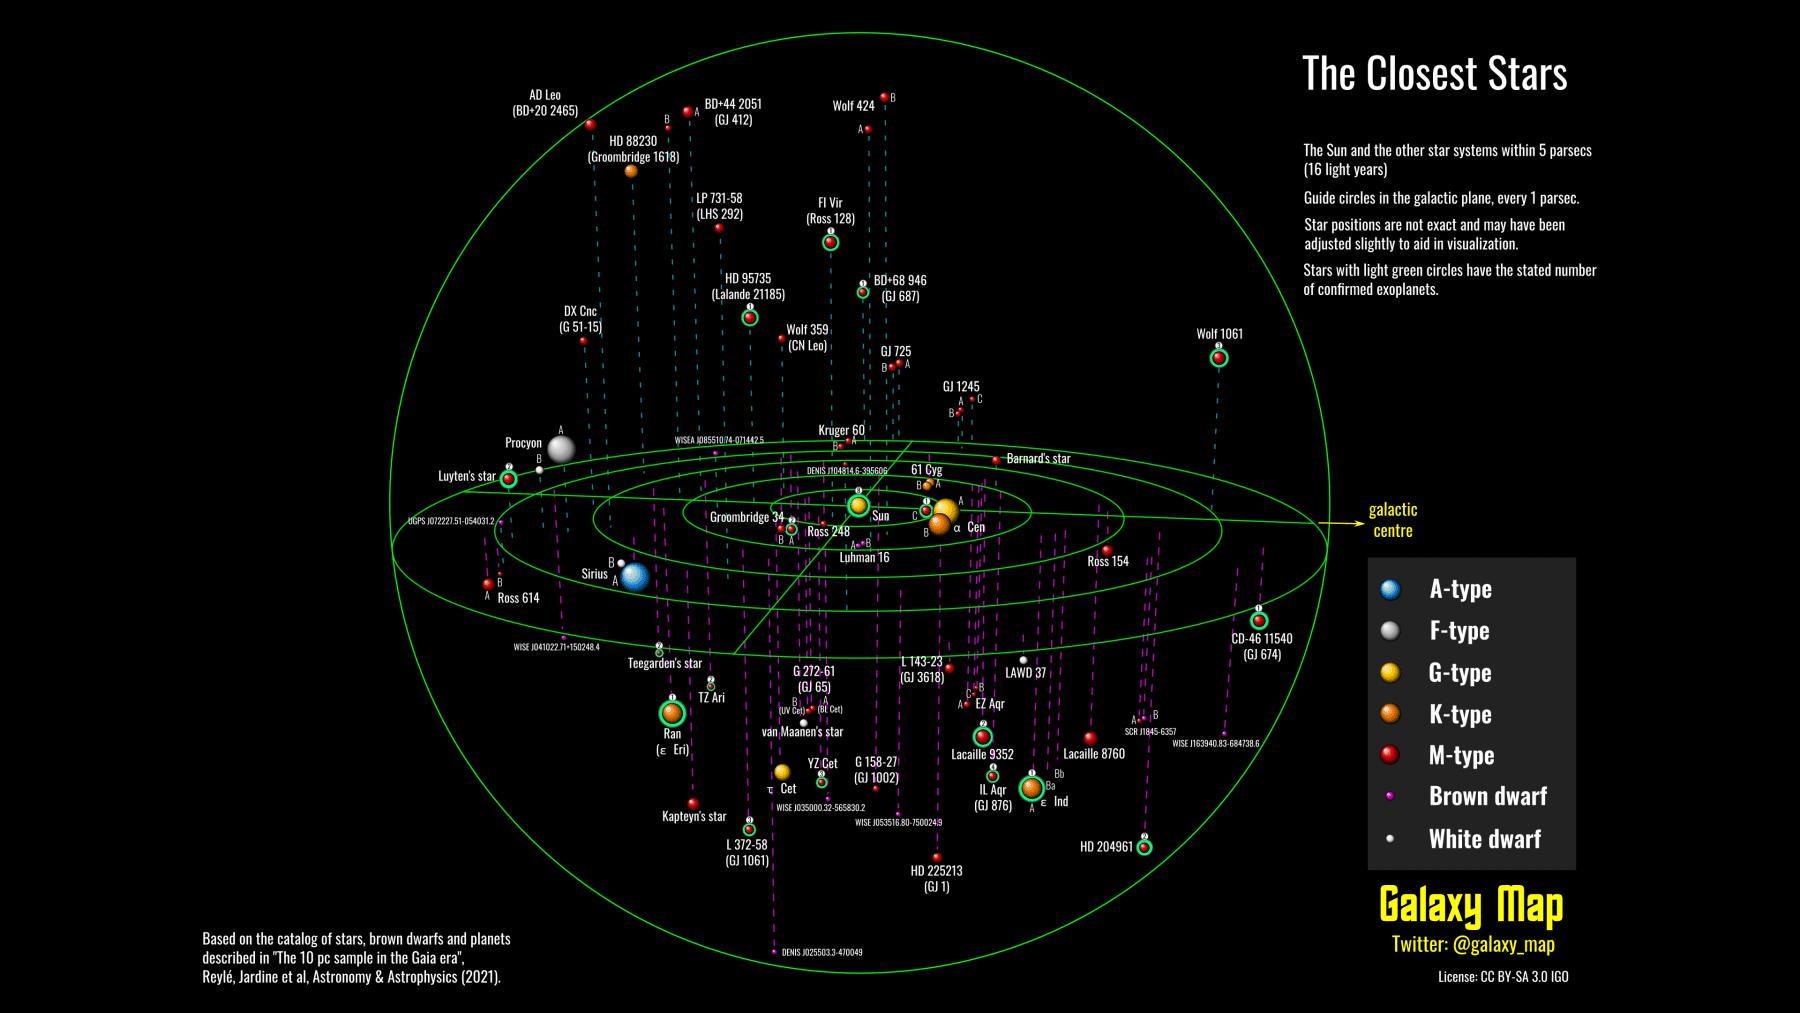 Star systems within the 5 parsecs range. Credit: Galaxymap.org